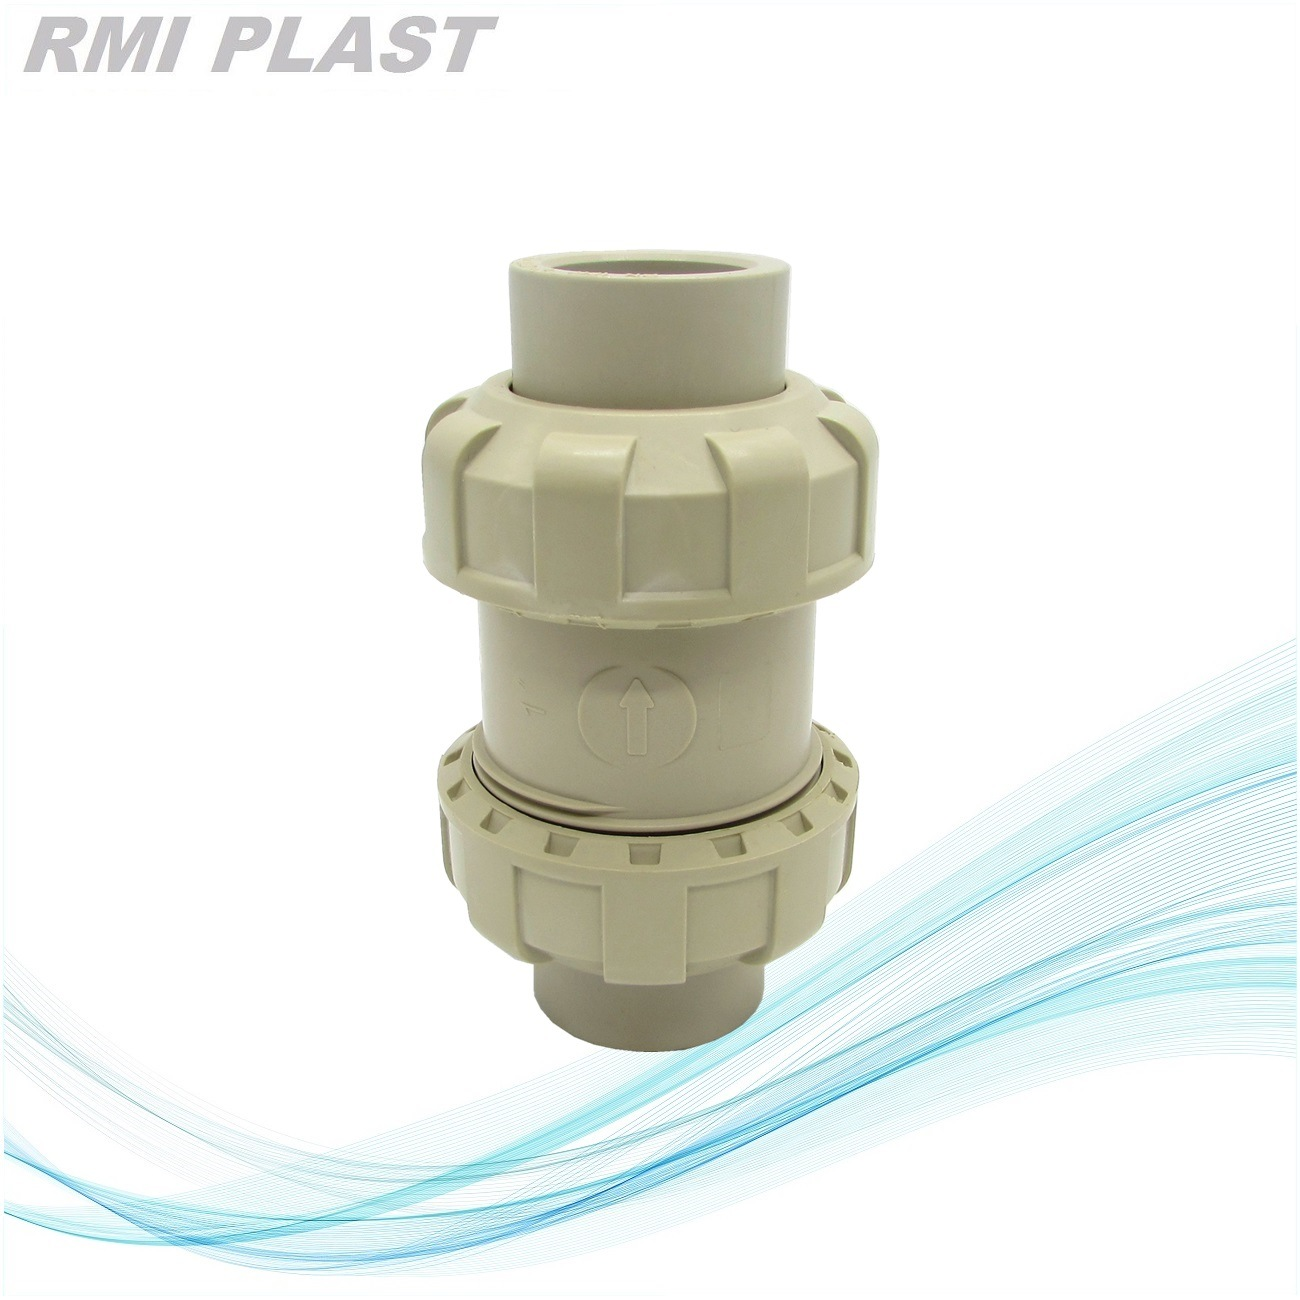 PVC Water Check Valve by ANSI JIS DIN Cns